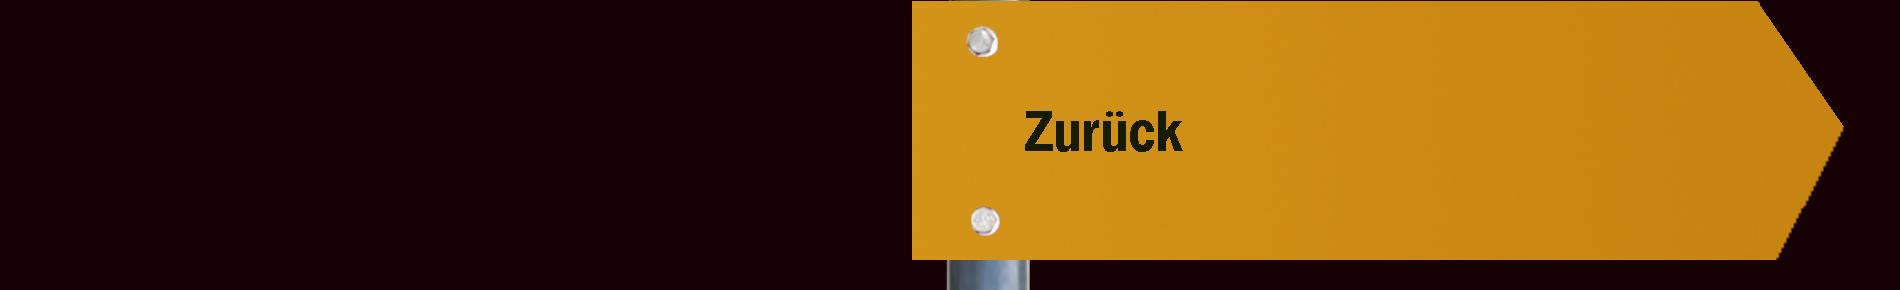 WWR_Zurueck